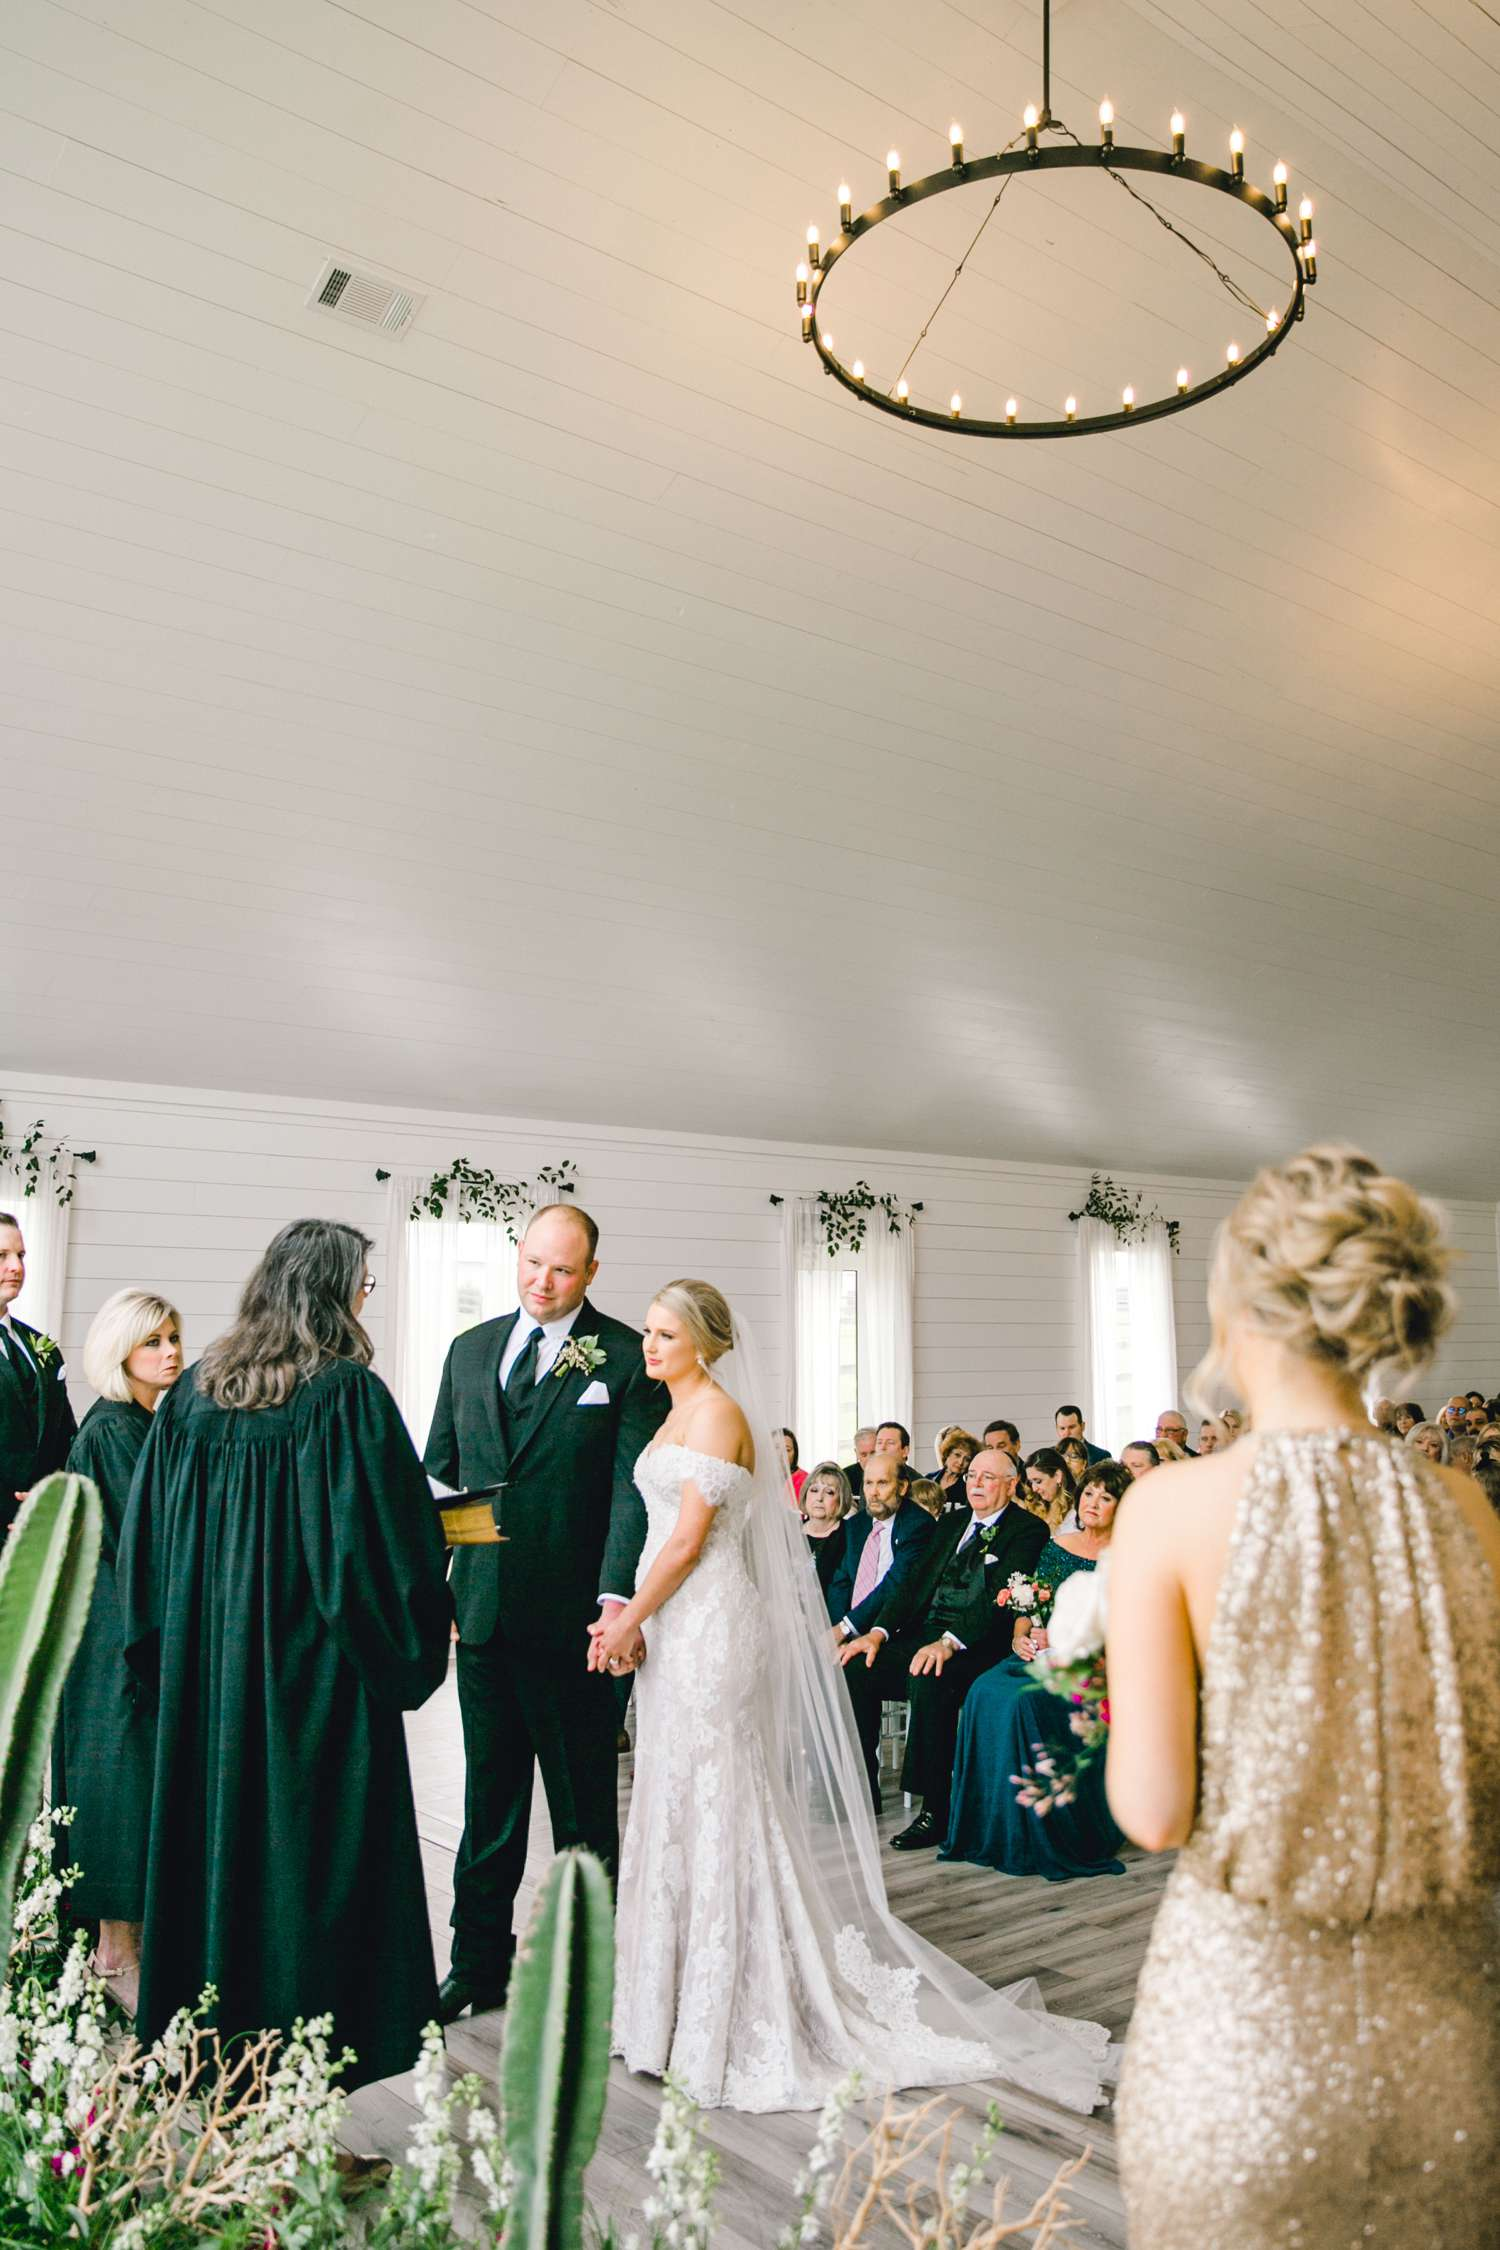 HEBERT_MORGAN_AND_CLAY_ALLEEJ_THE_FARMHOUSE_MONTGOMERY_TEXAS_WEDDING_0096.jpg